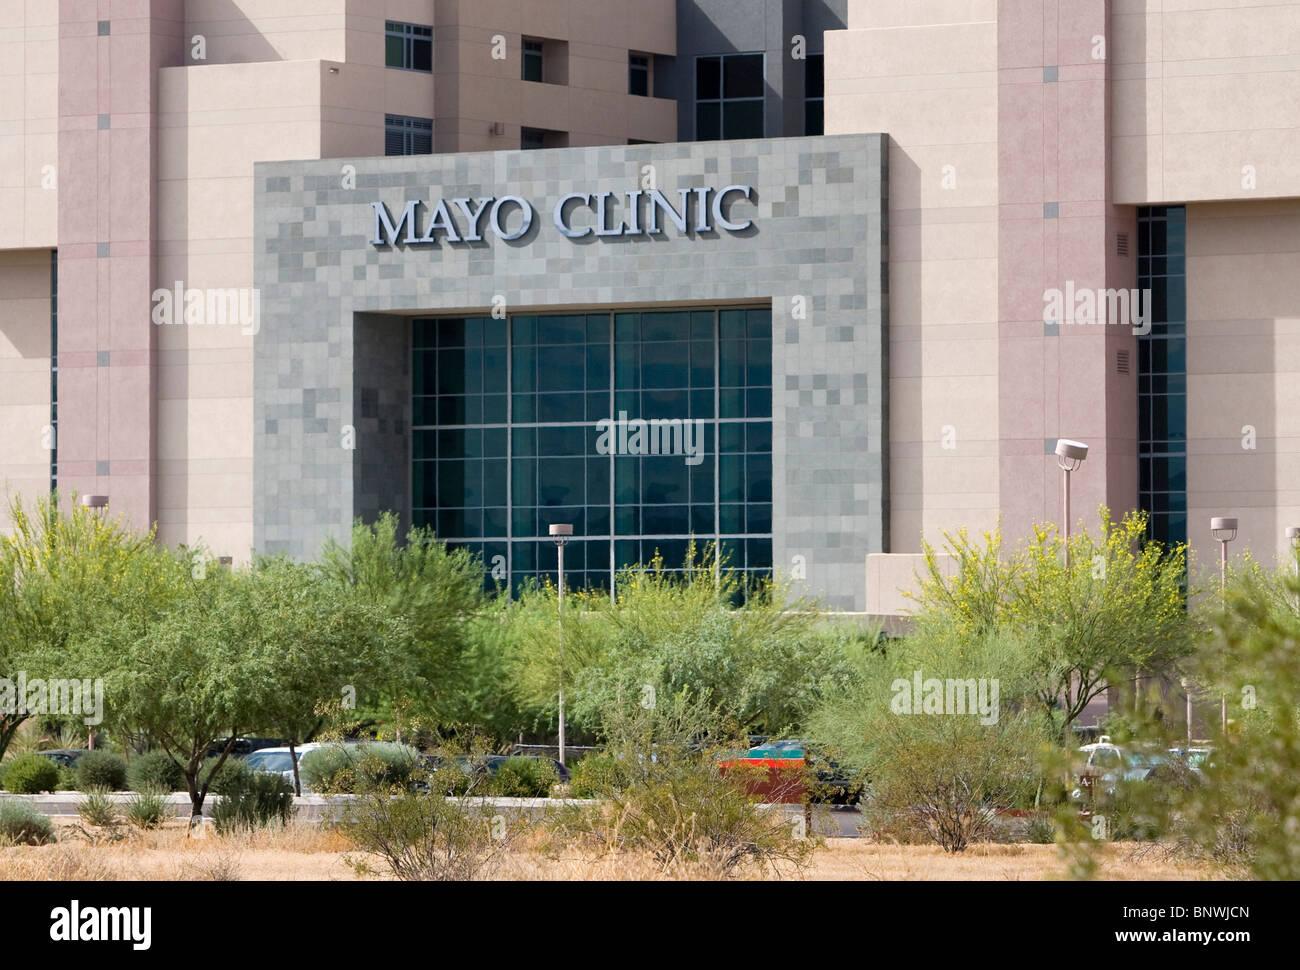 The Mayo Clinic in Arizona.  - Stock Image